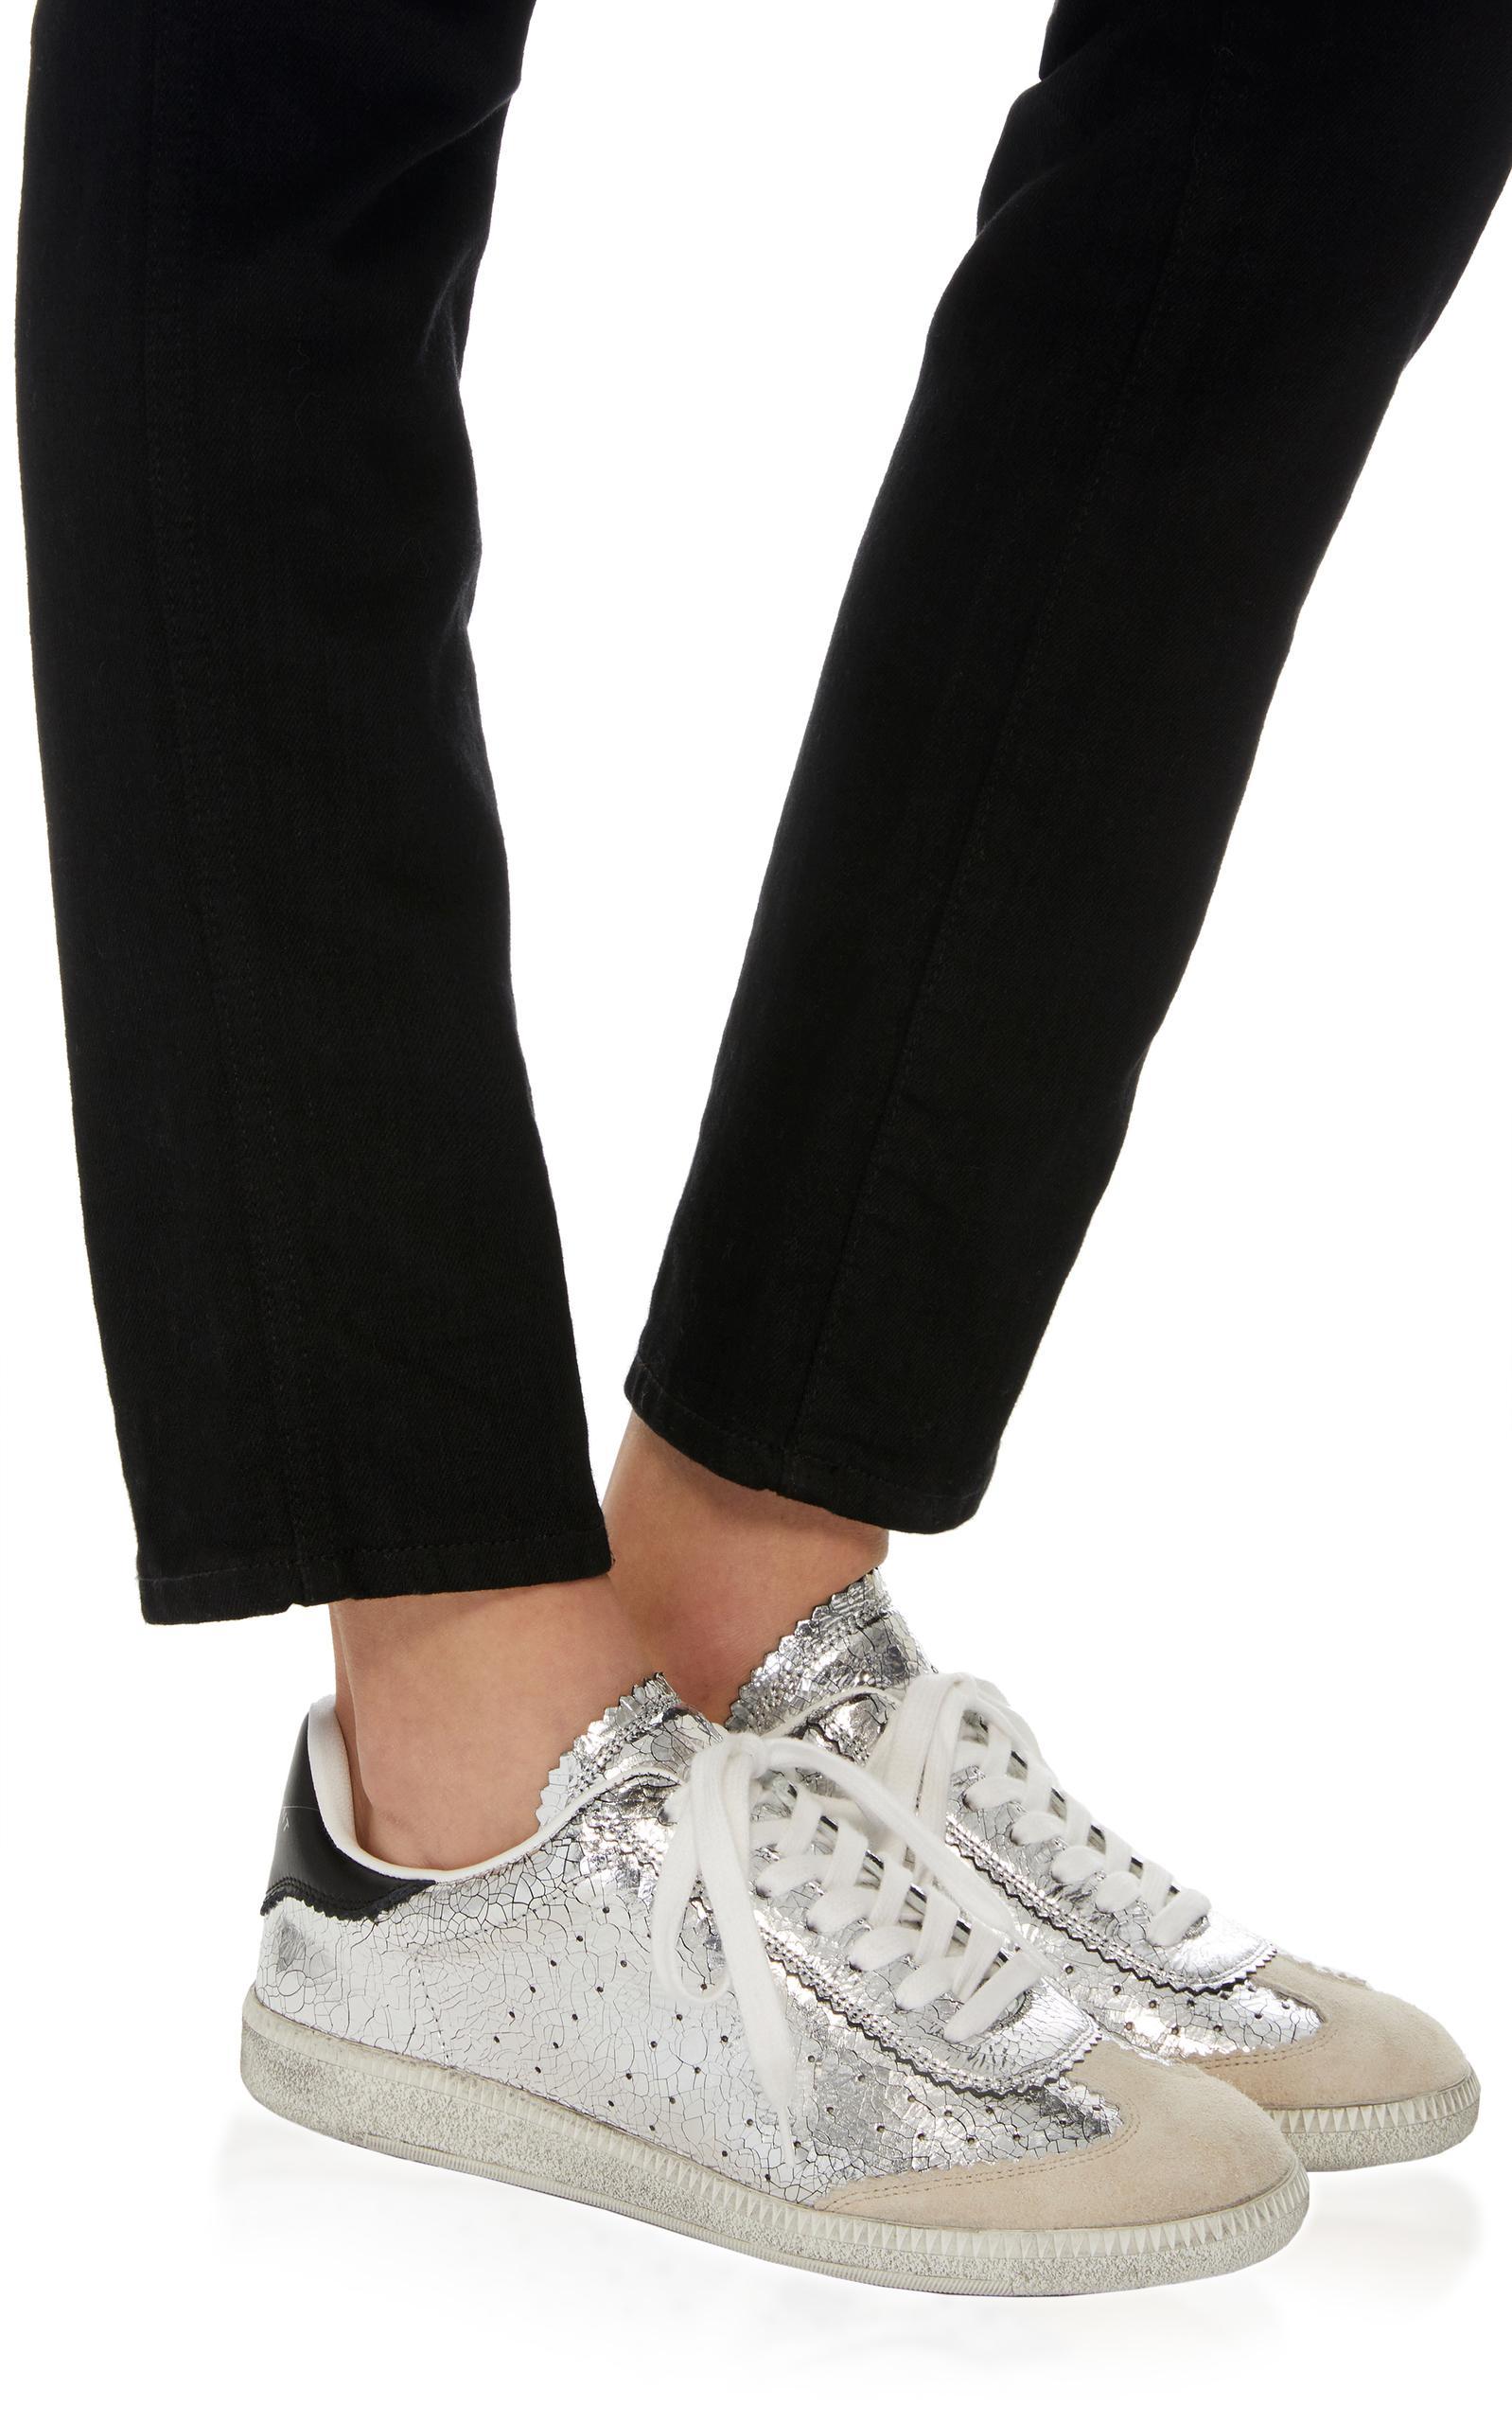 0e91d23dd3 Isabel Marant Bryce Metallic Leather Sneakers in Metallic - Lyst